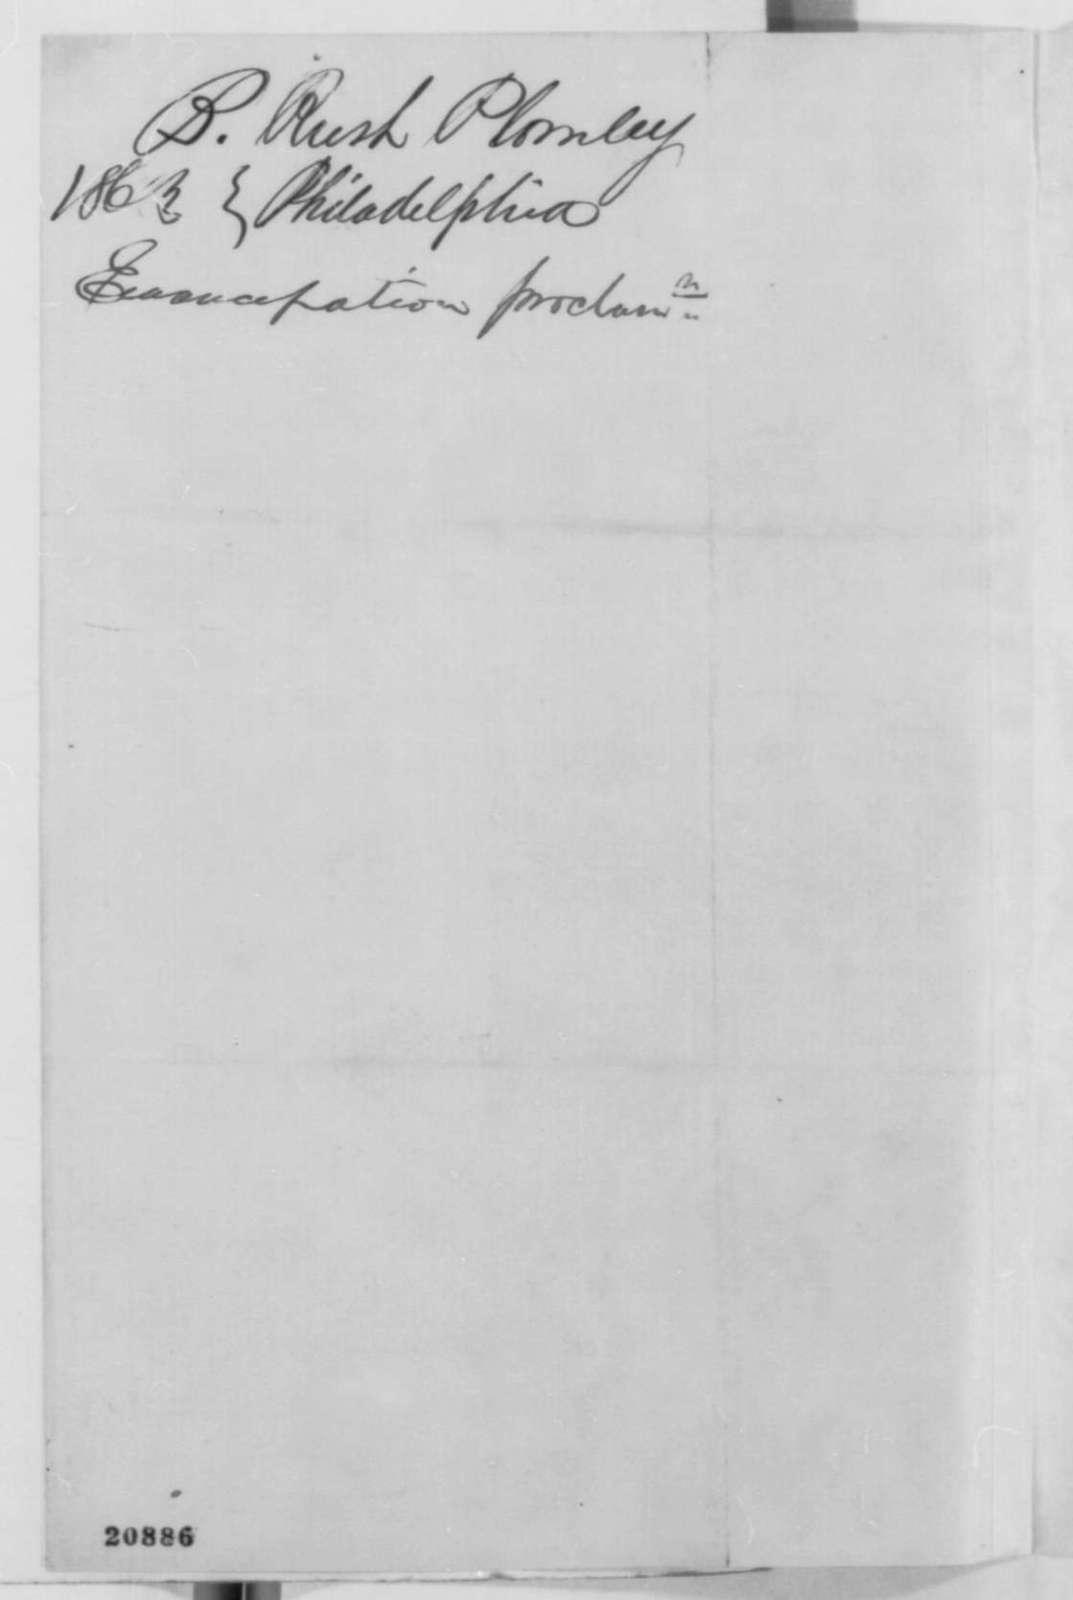 Benjamin Rush Plumly to Abraham Lincoln, Thursday, January 01, 1863  (Reaction to Emancipation Proclamation in Philadelphia)